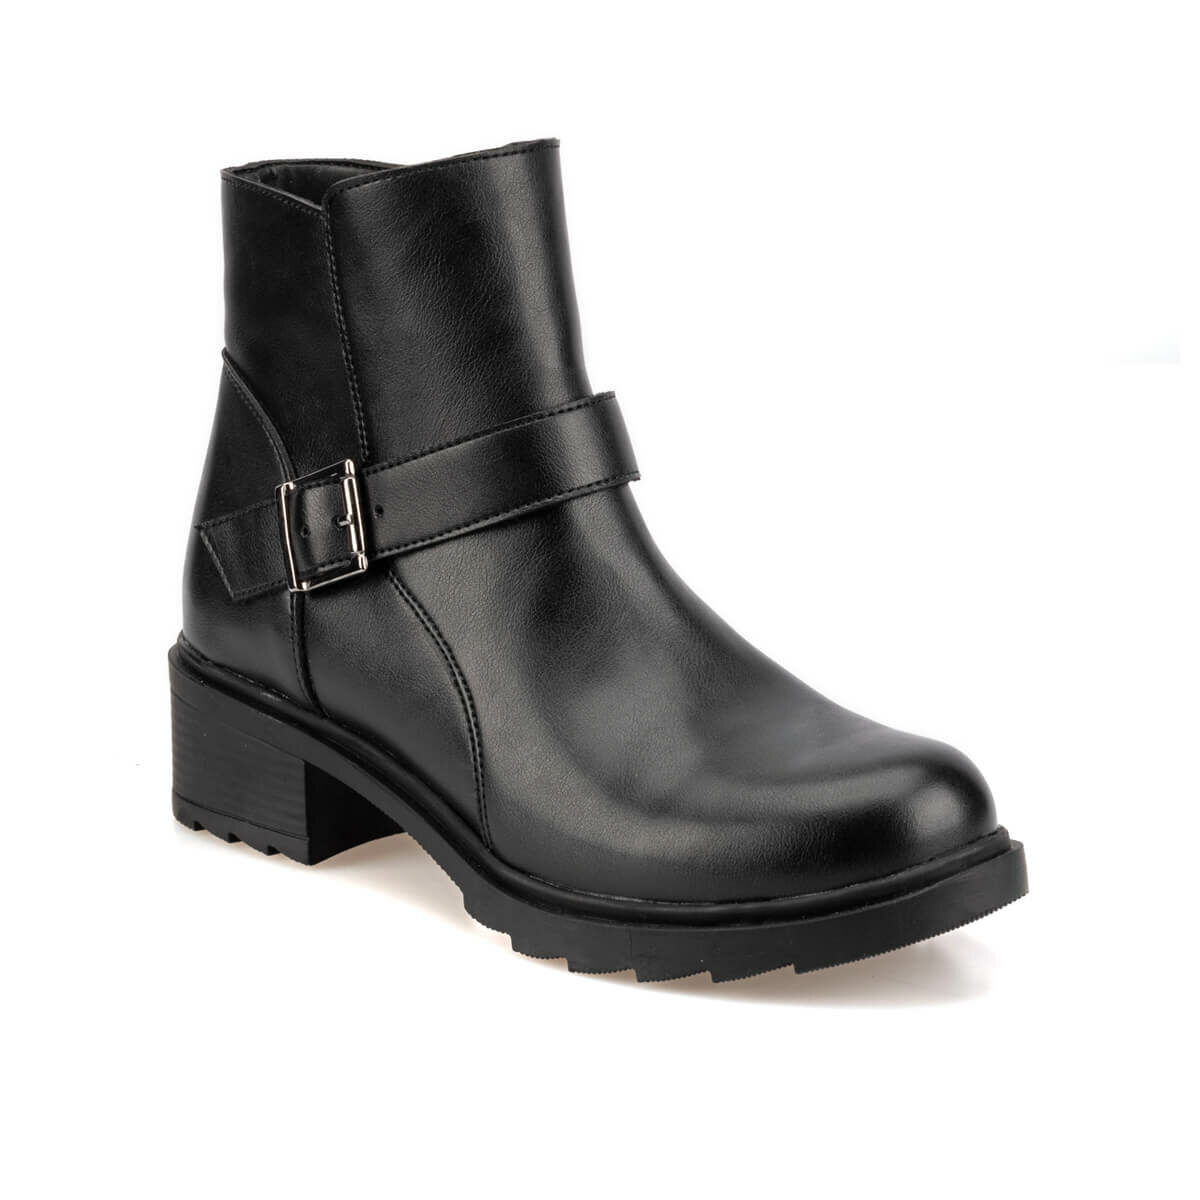 FLO 92.314713.Z أحذية نسائية سوداء بولاريس